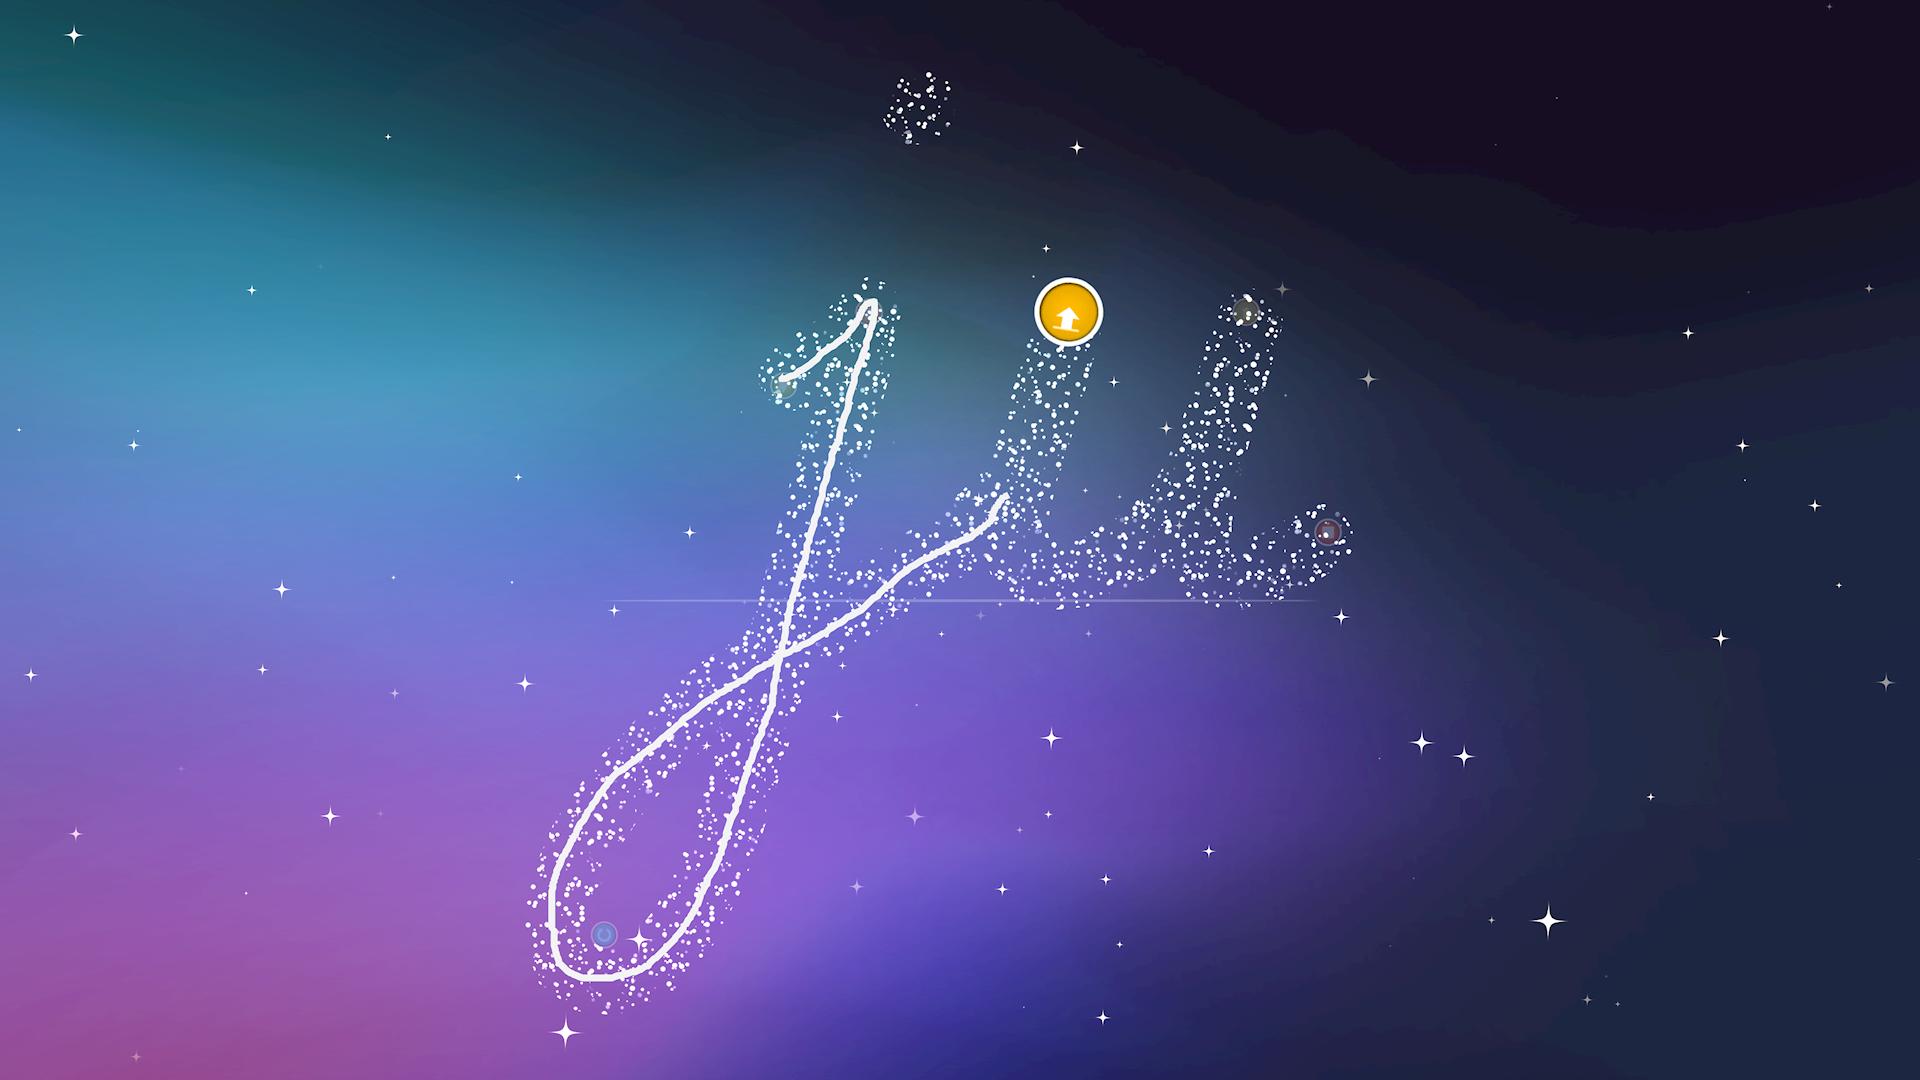 schrijfapp luna